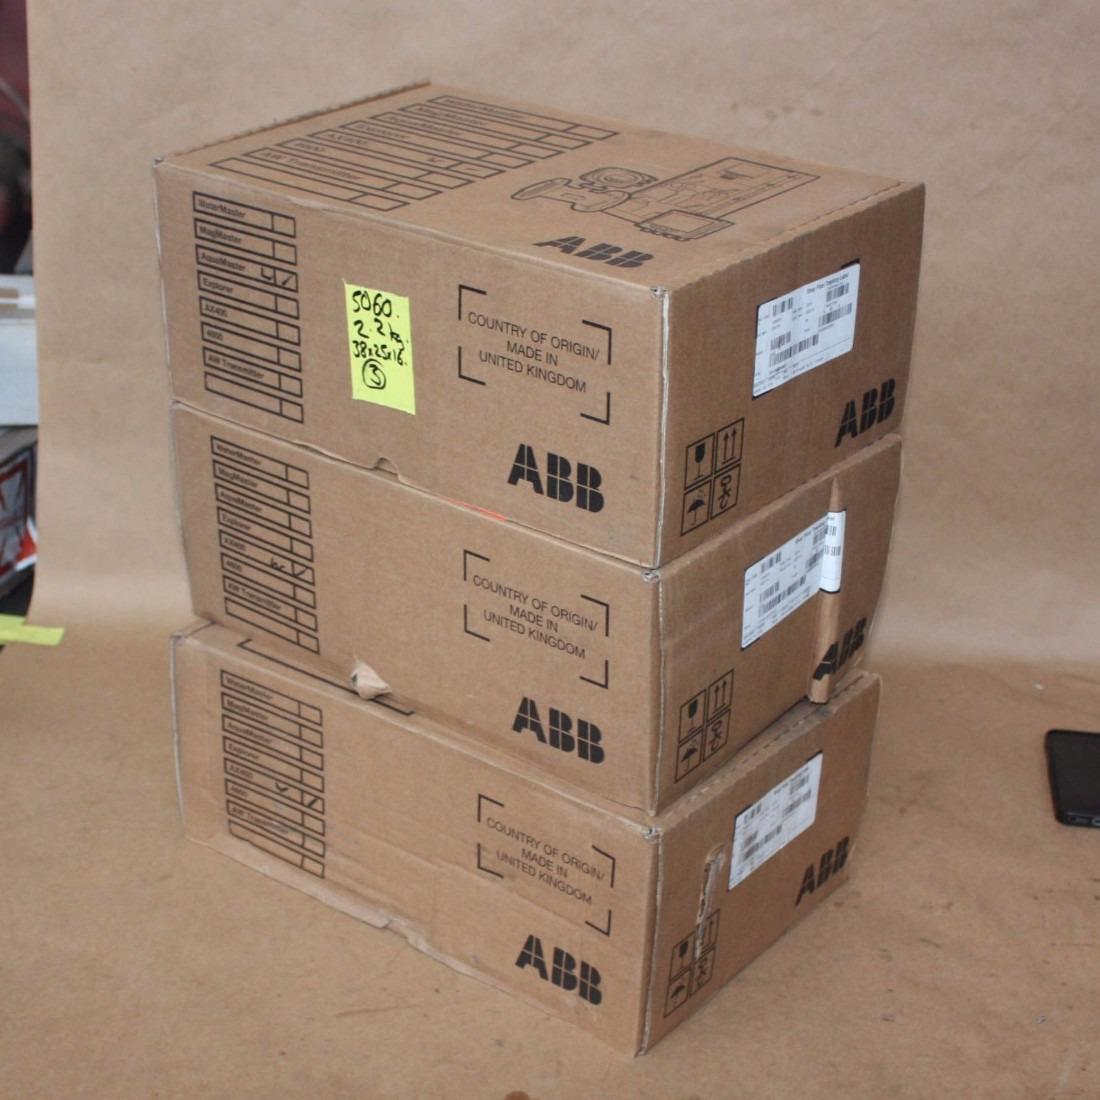 5bCR5aWz6KKr5by65aW46Ieq5ouN_aw600049/aw600048/aw600741/aw601115 abb硅表备件aw